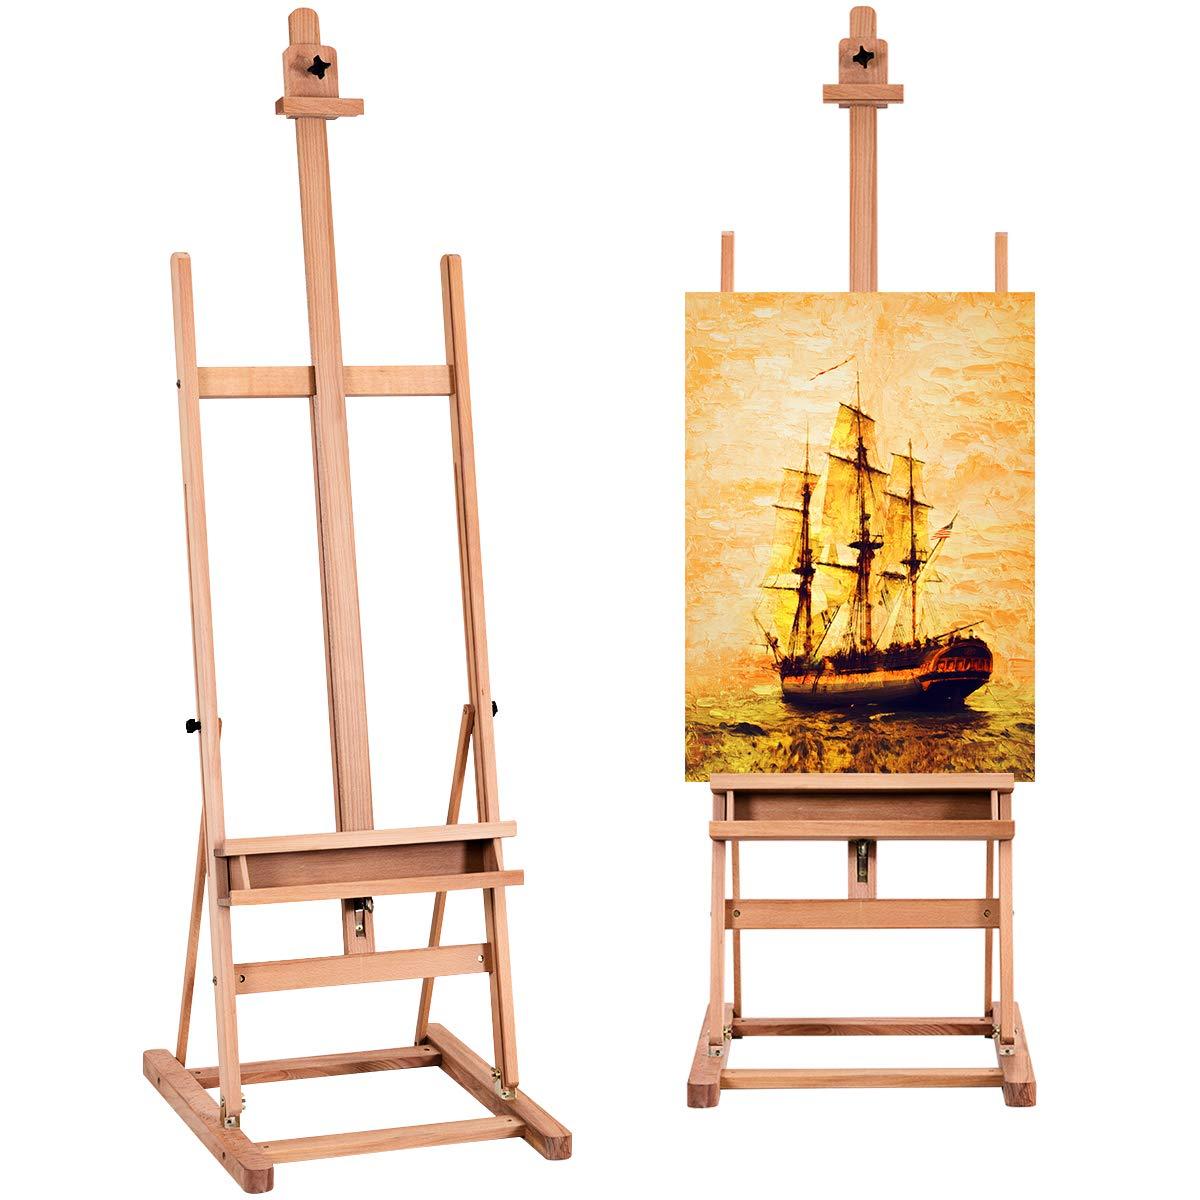 TANGKULA H-Frame Easel Wooden Height and Angle Adjustable Foldable Tilting Floor Studio Artist Easel Painting, Sketching, Display